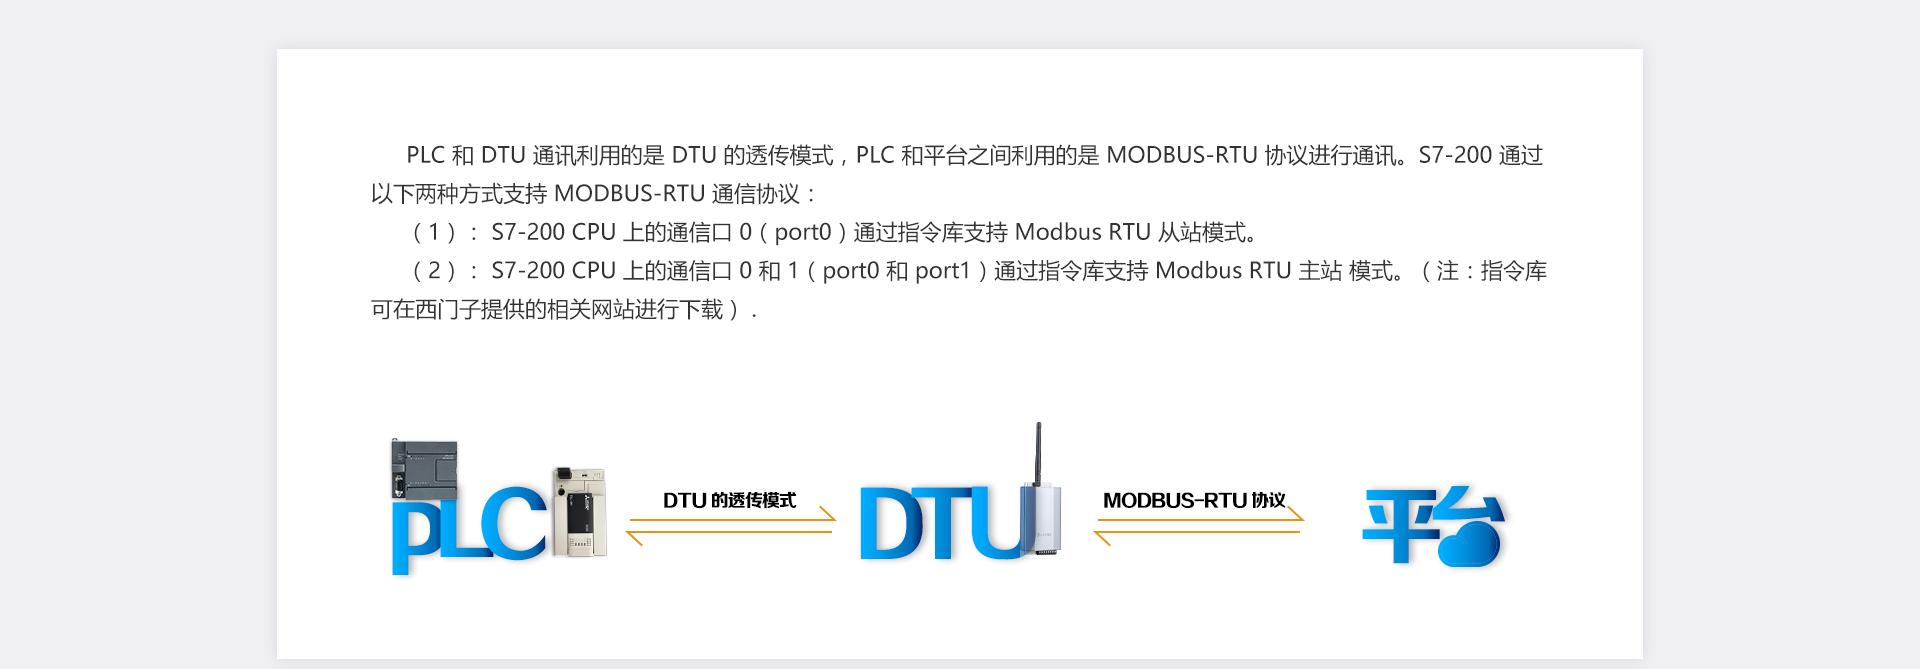 PLC远程监控